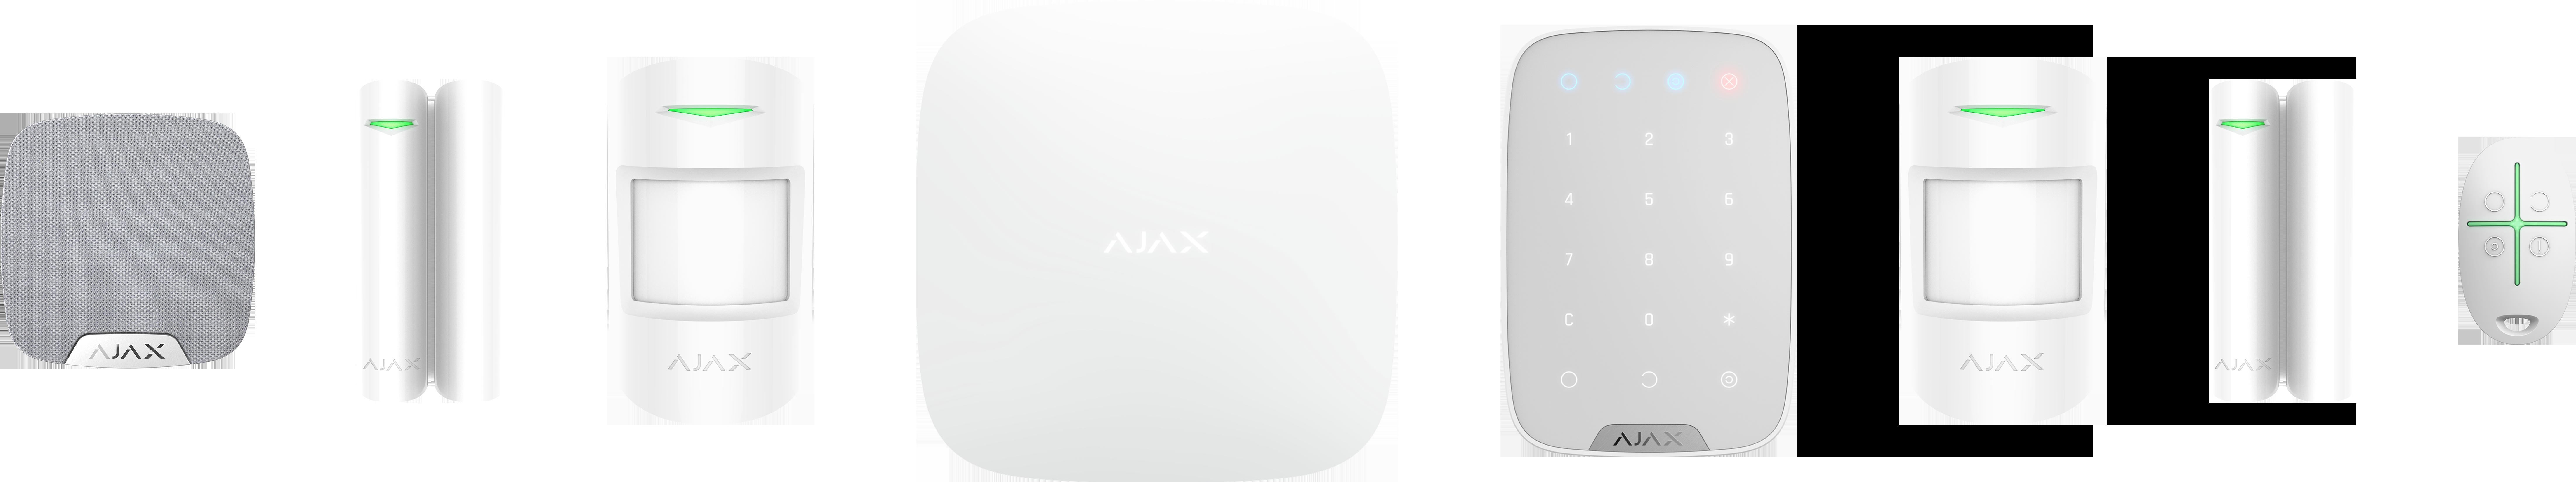 Ajax systeme